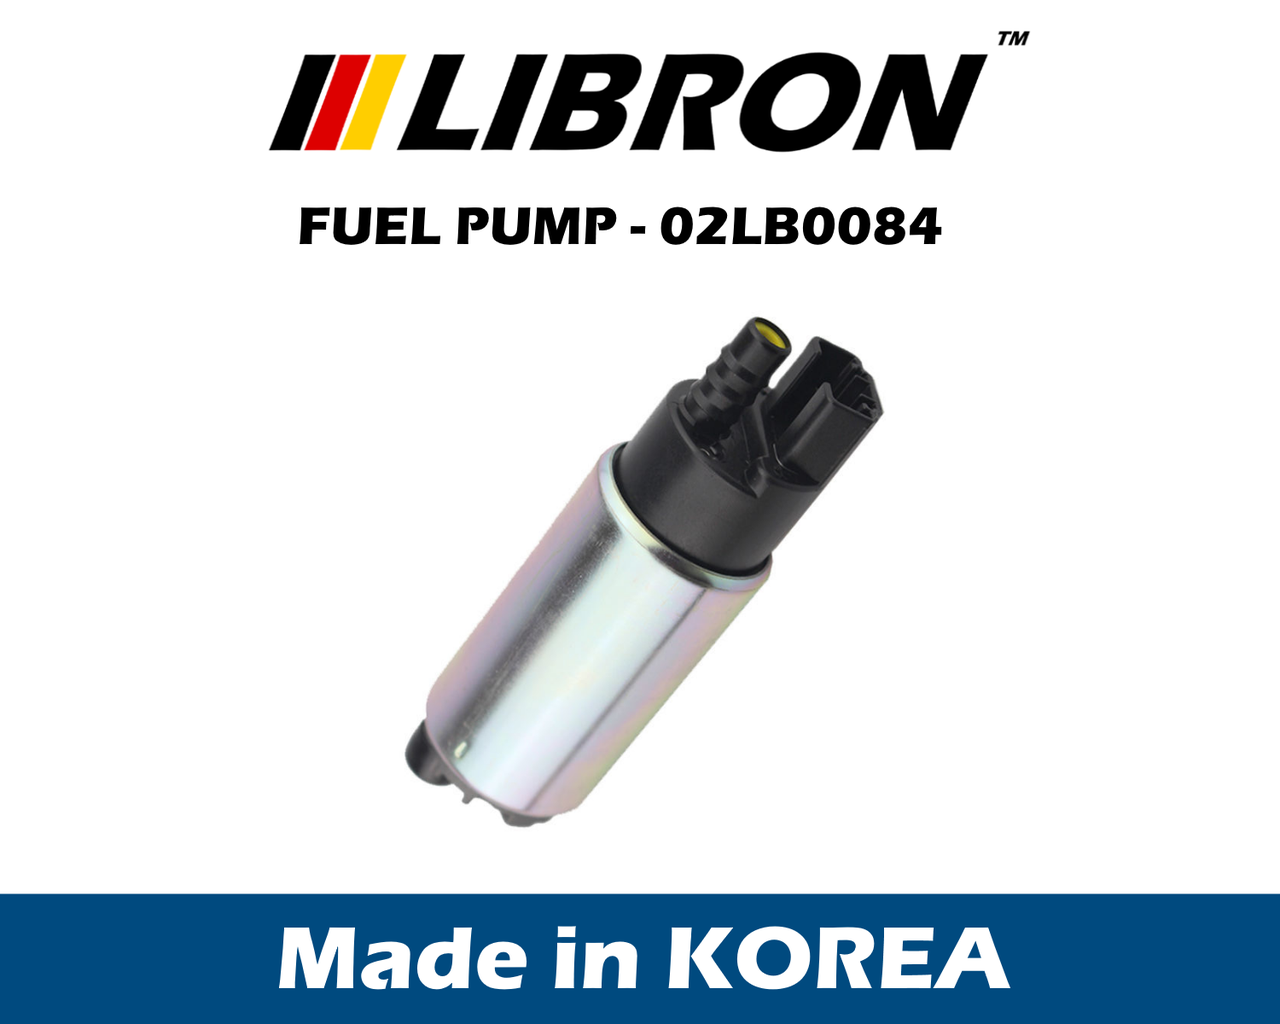 Топливный насос LIBRON 02LB0084 - Мазда MX-5 II